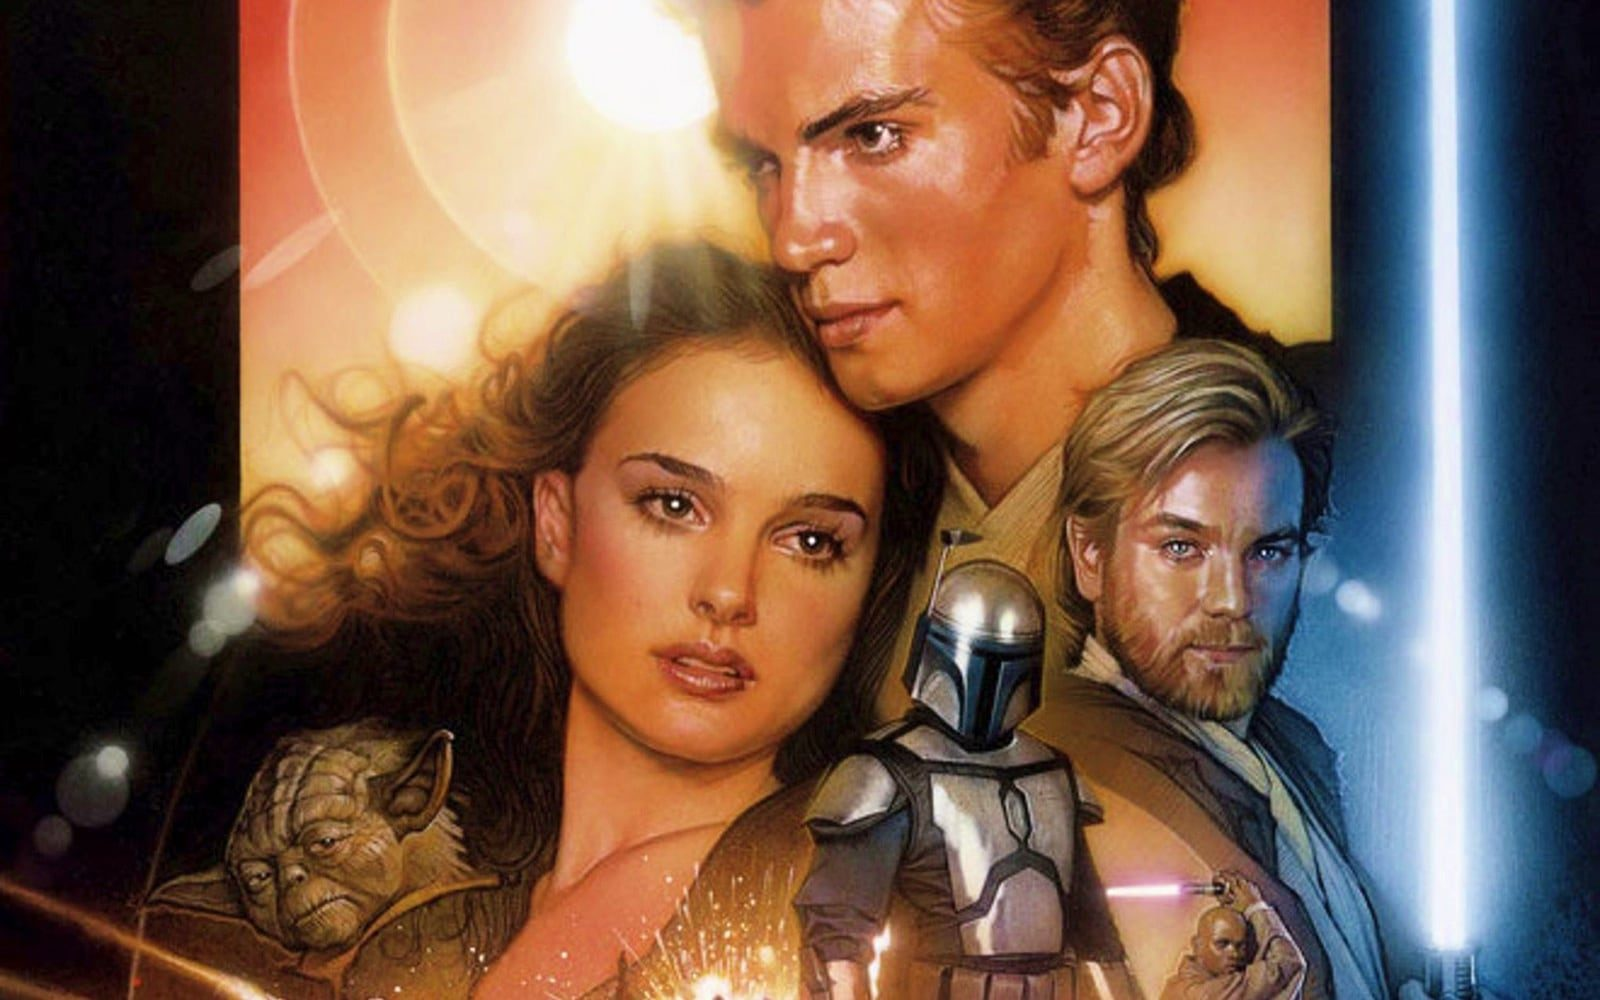 Attack of the Clones - George Lucas